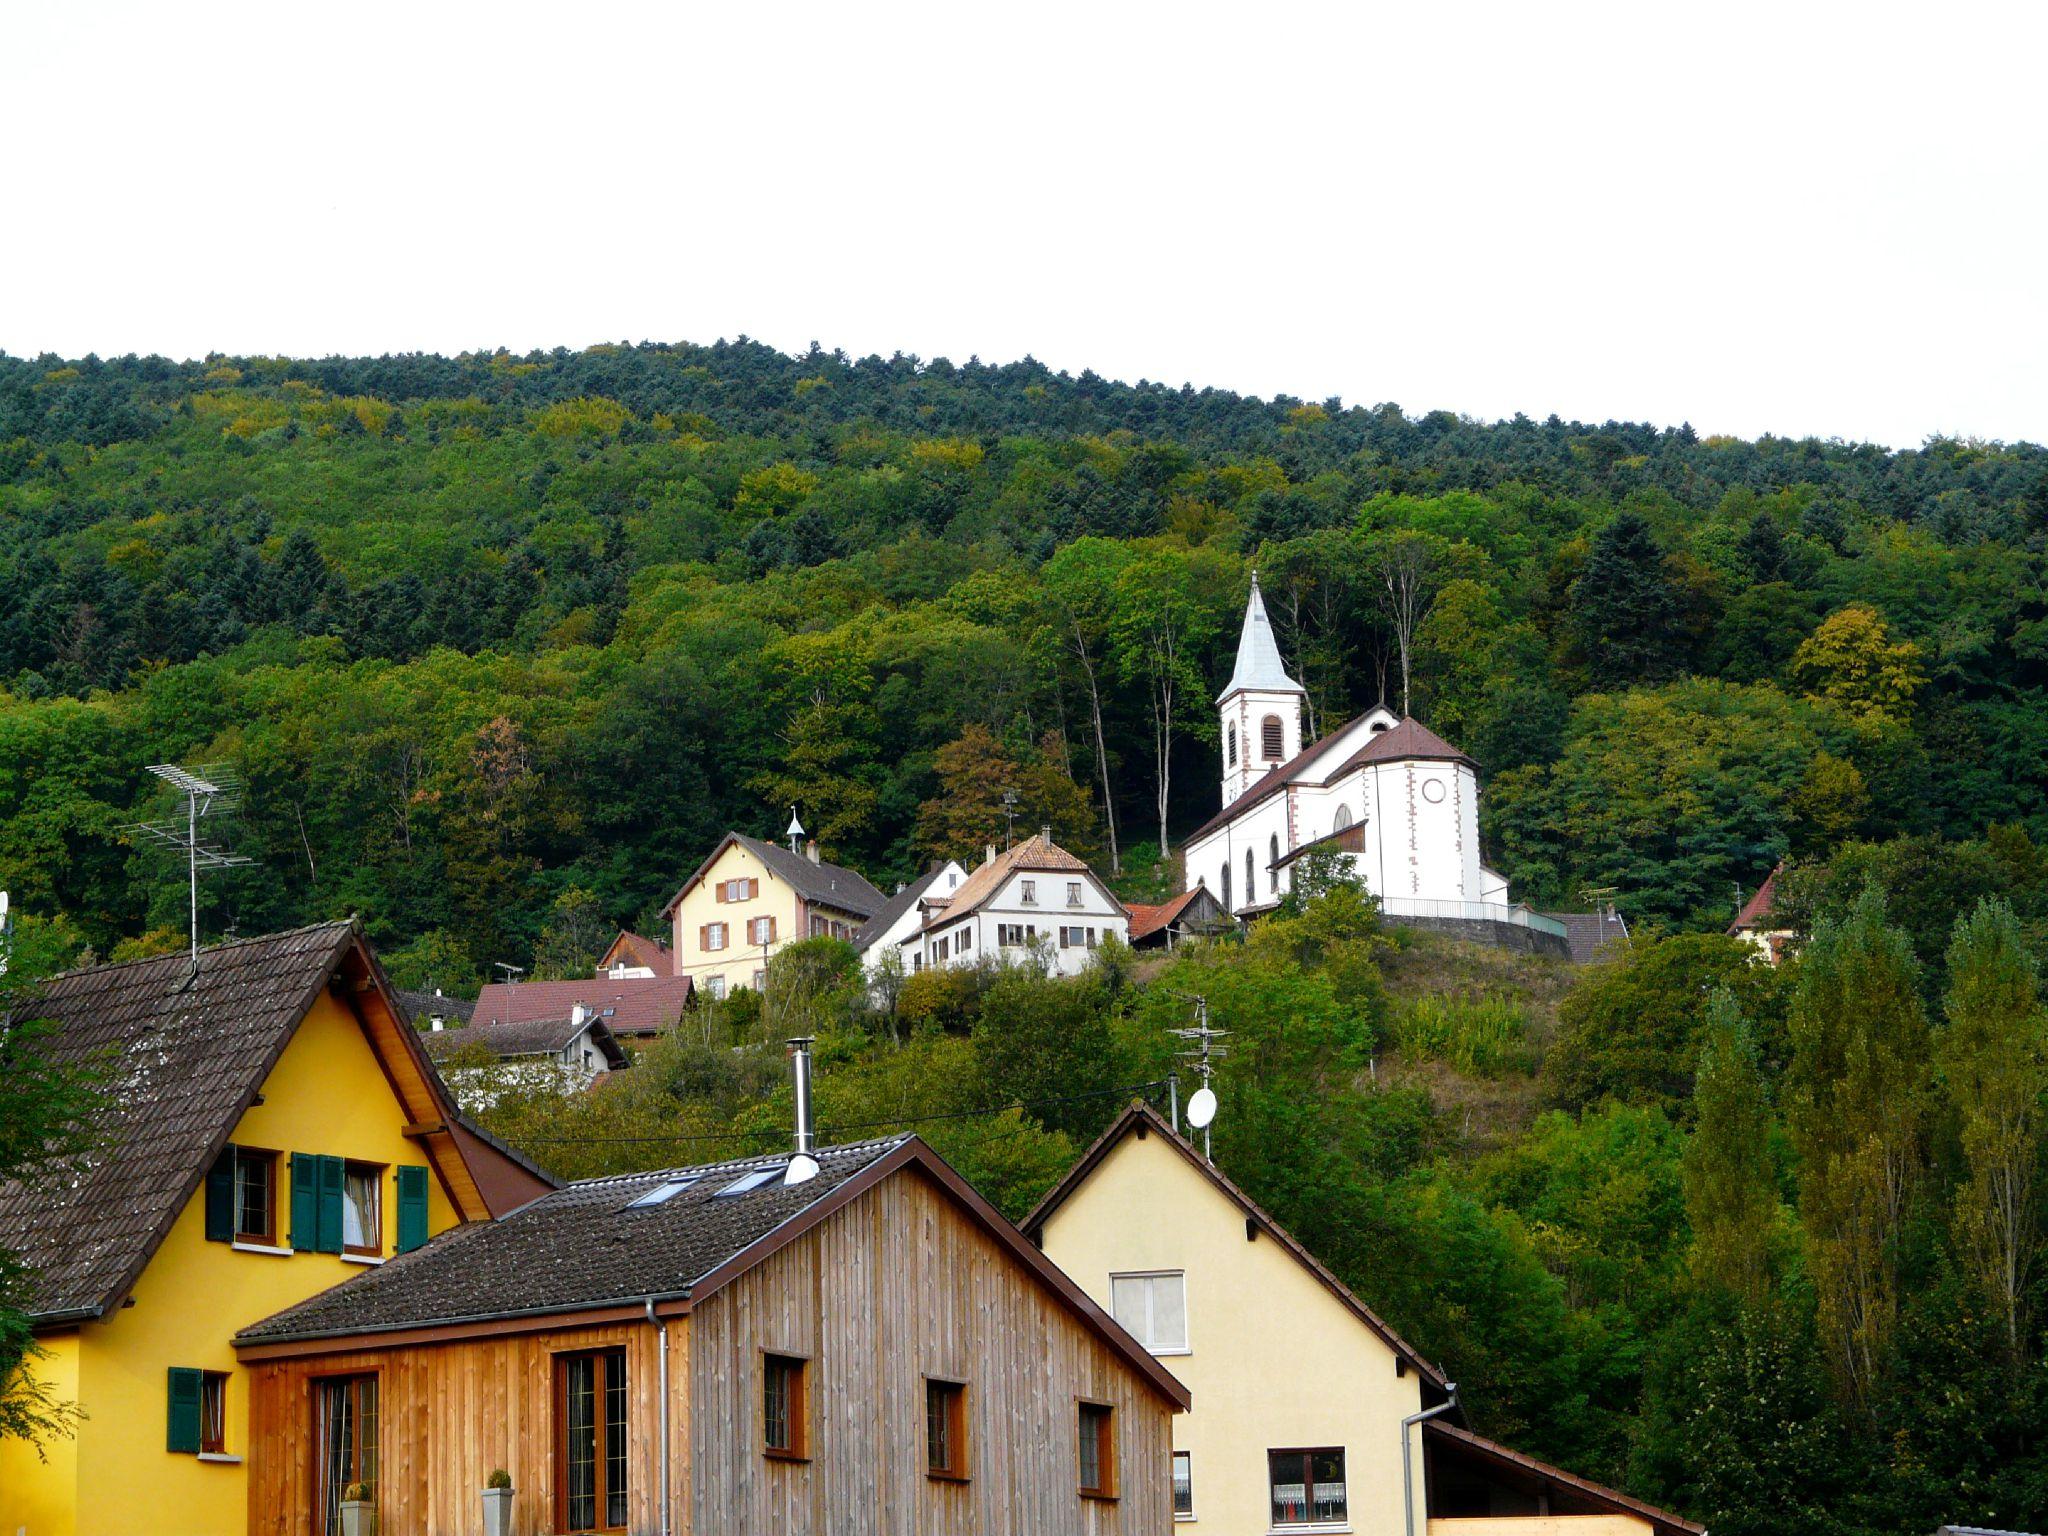 Rimbachzell (1)